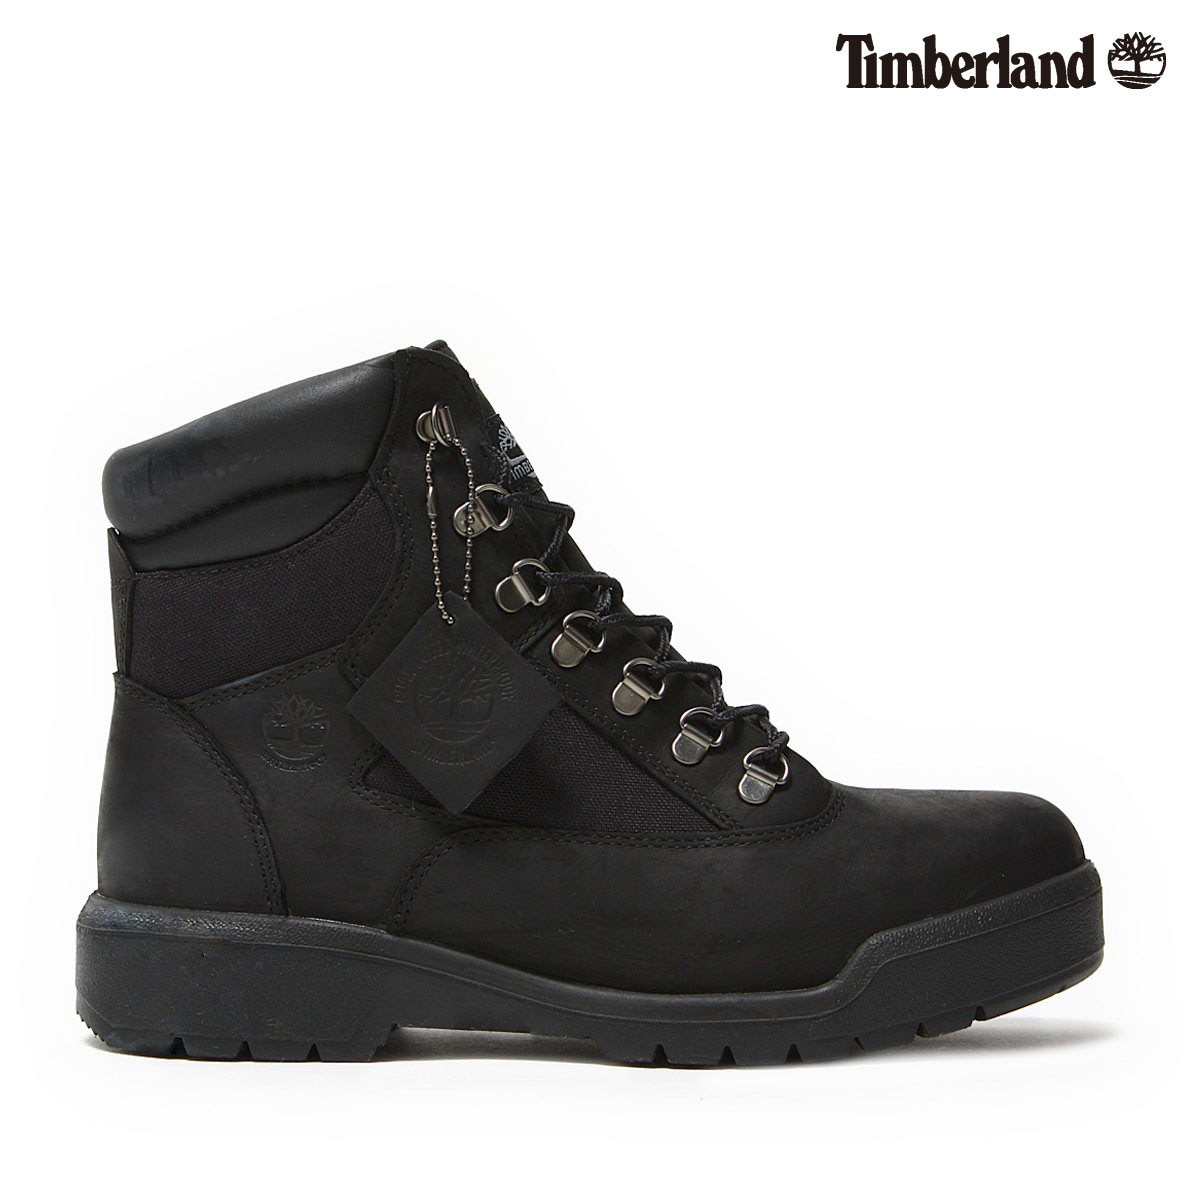 43b7abf59dd Men's Timberland Field Boot 6